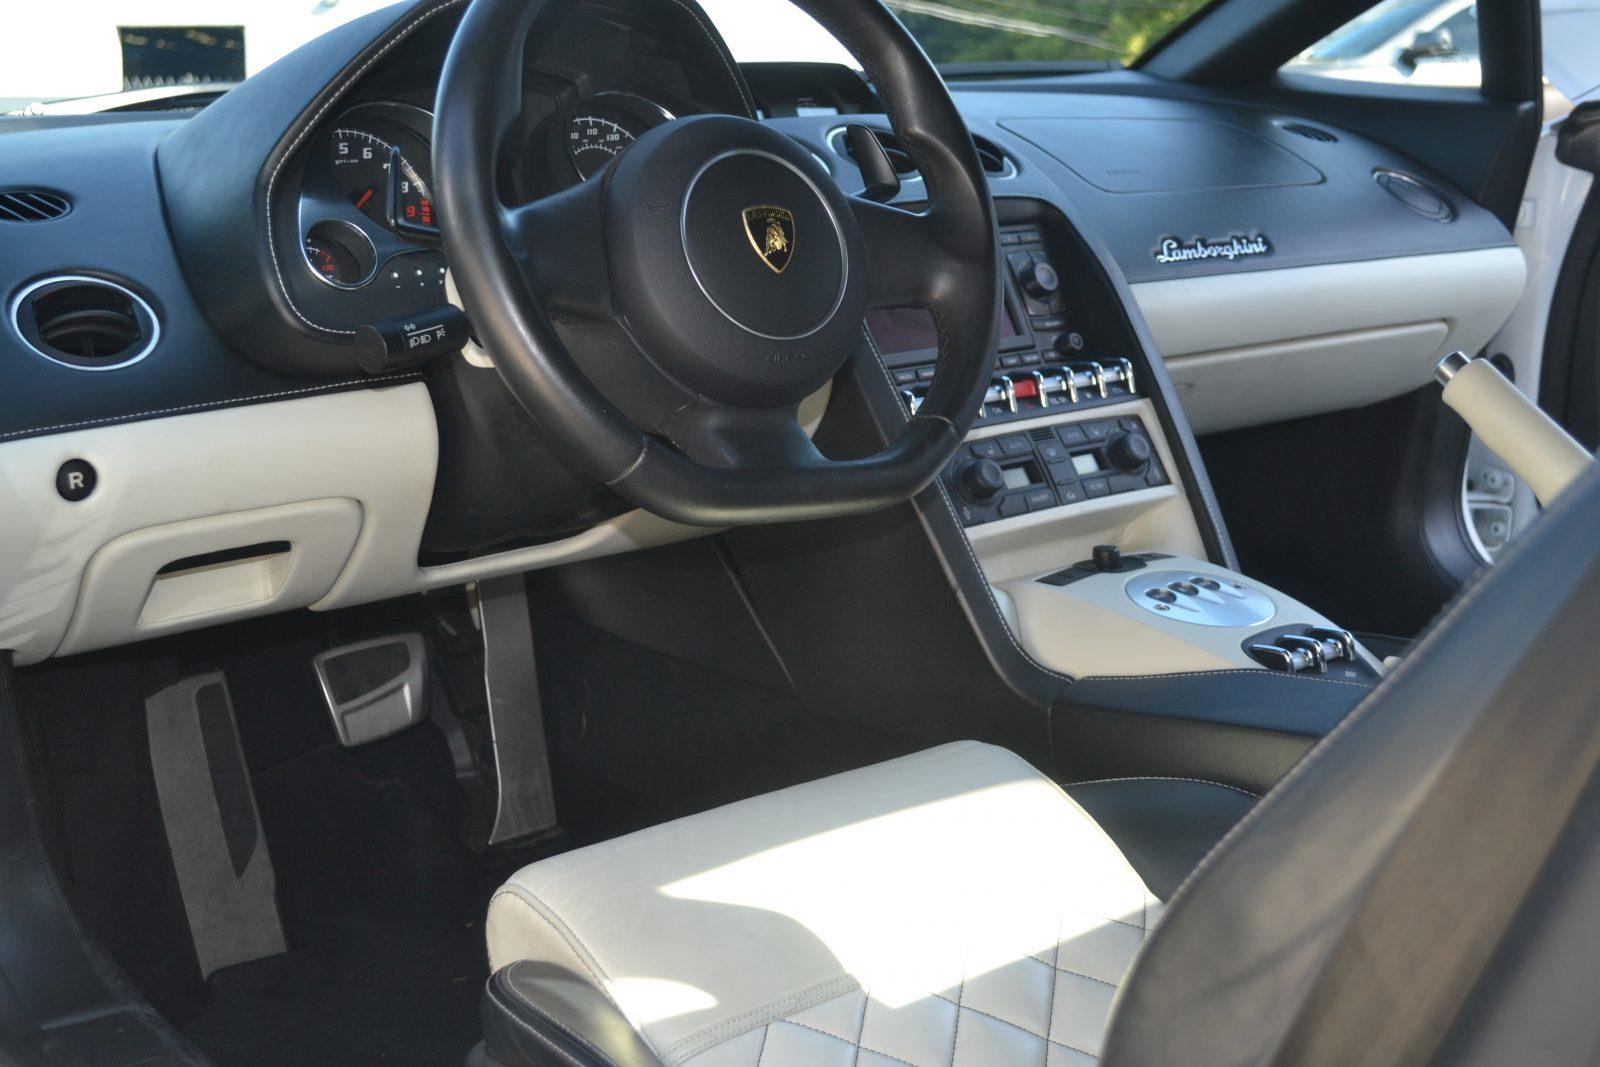 Interior Car Detailing Services